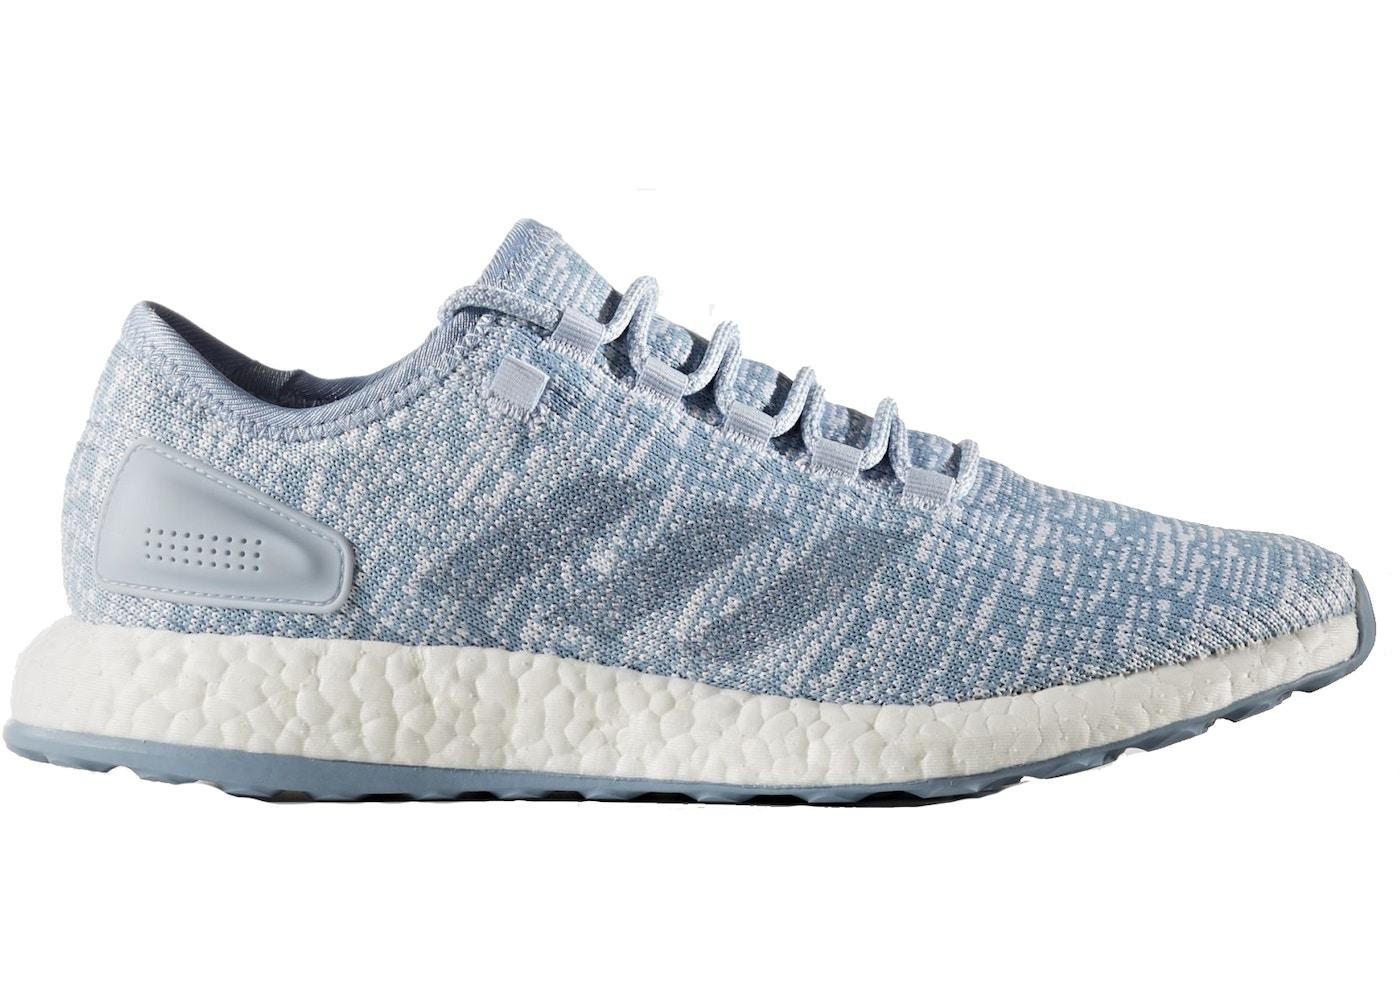 5d7fc461e42c5 adidas Pureboost 2017 Easy Blue - BA8894